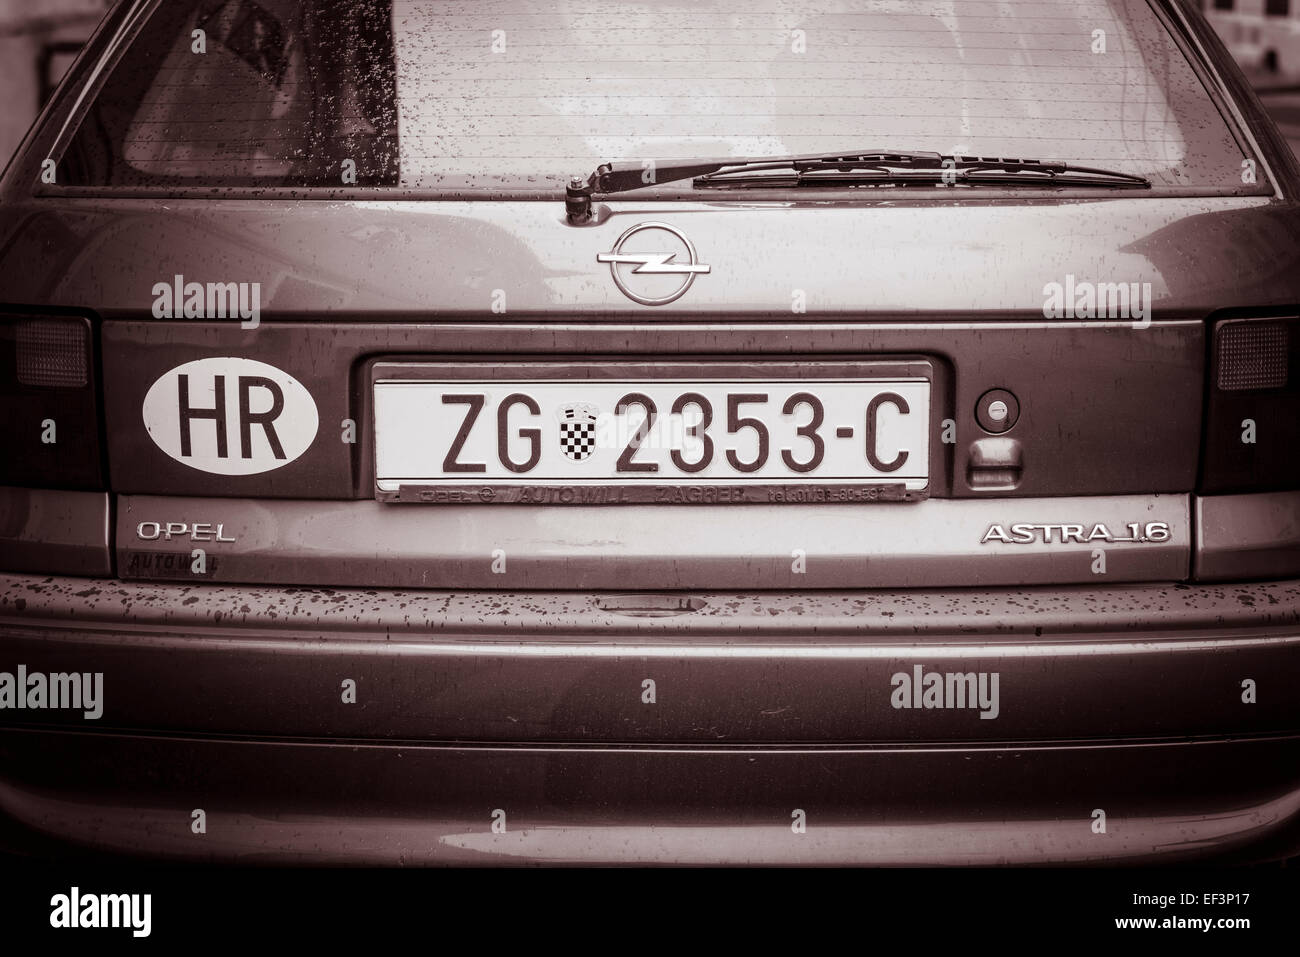 Car Auto License Plate Tag Stockfotos & Car Auto License Plate Tag ...